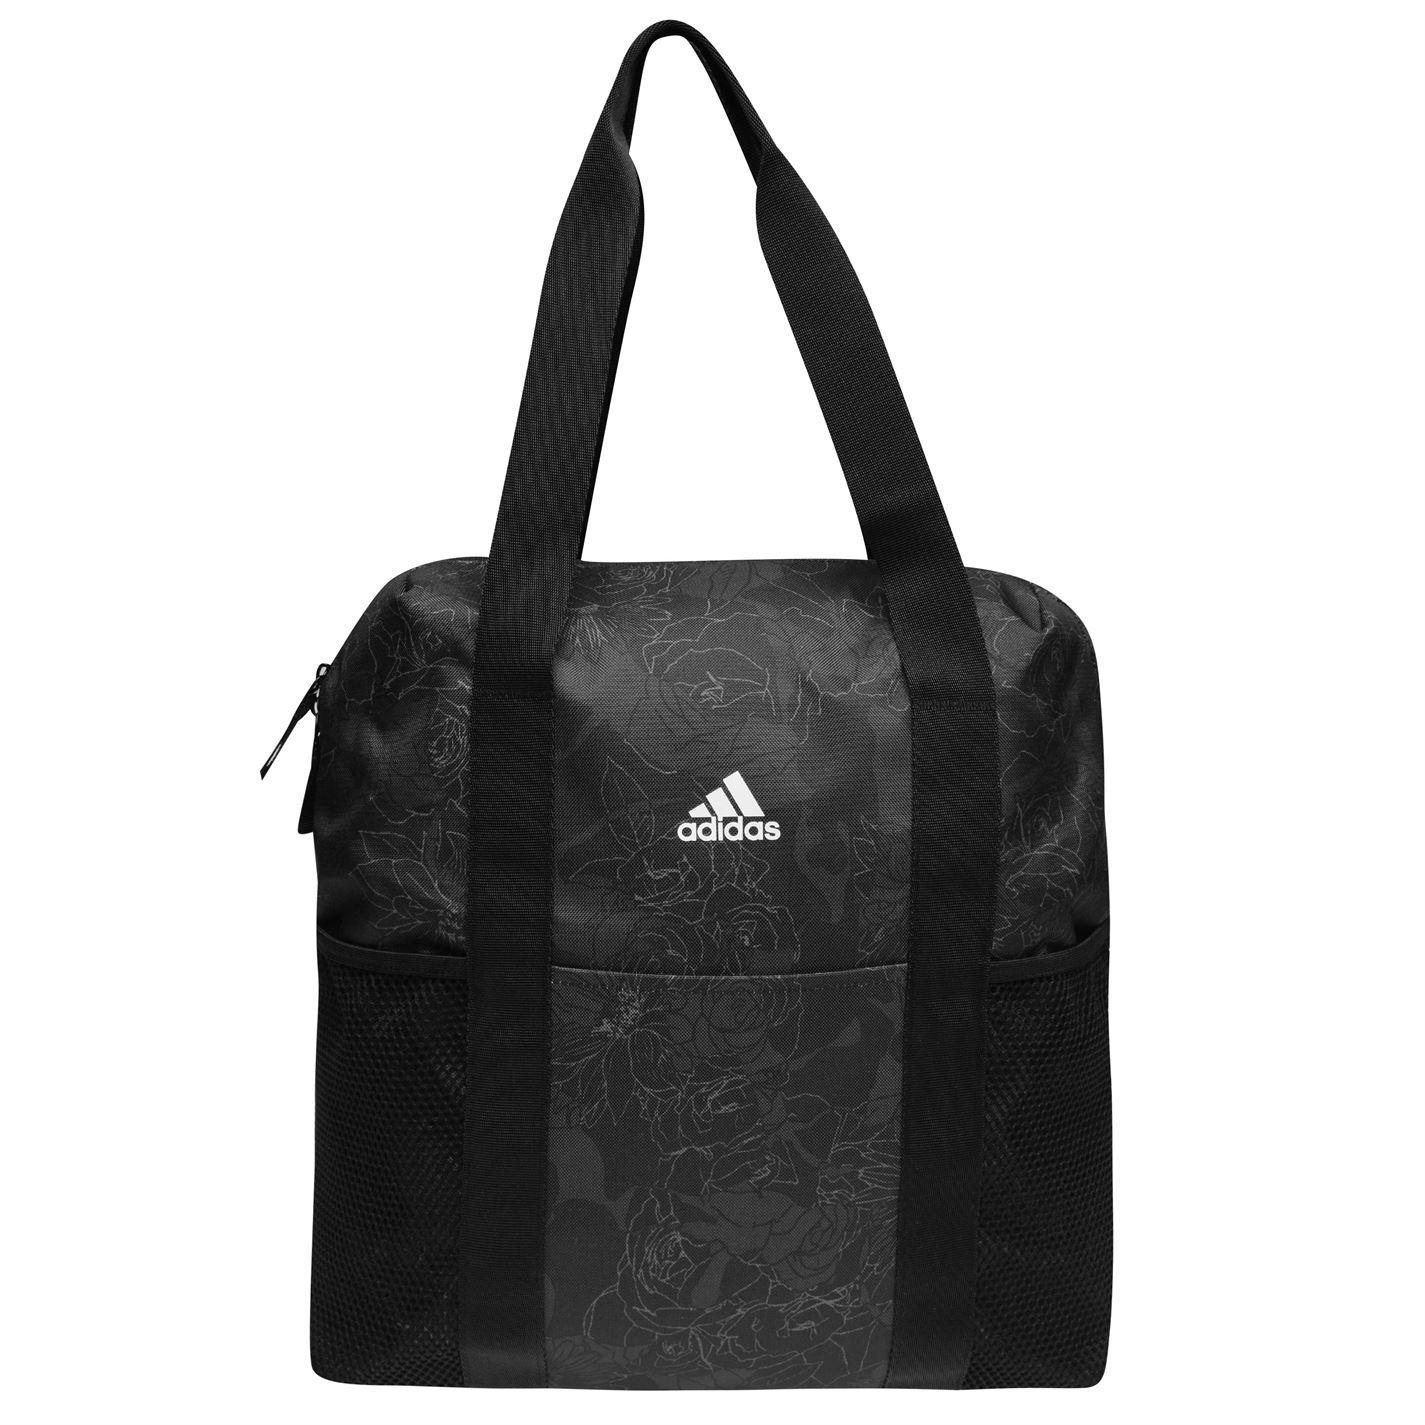 f27976a81 ... adidas Fav Floral Tote Bag Womens Black/Grey Holdall Handbag Shopper  Bag ...